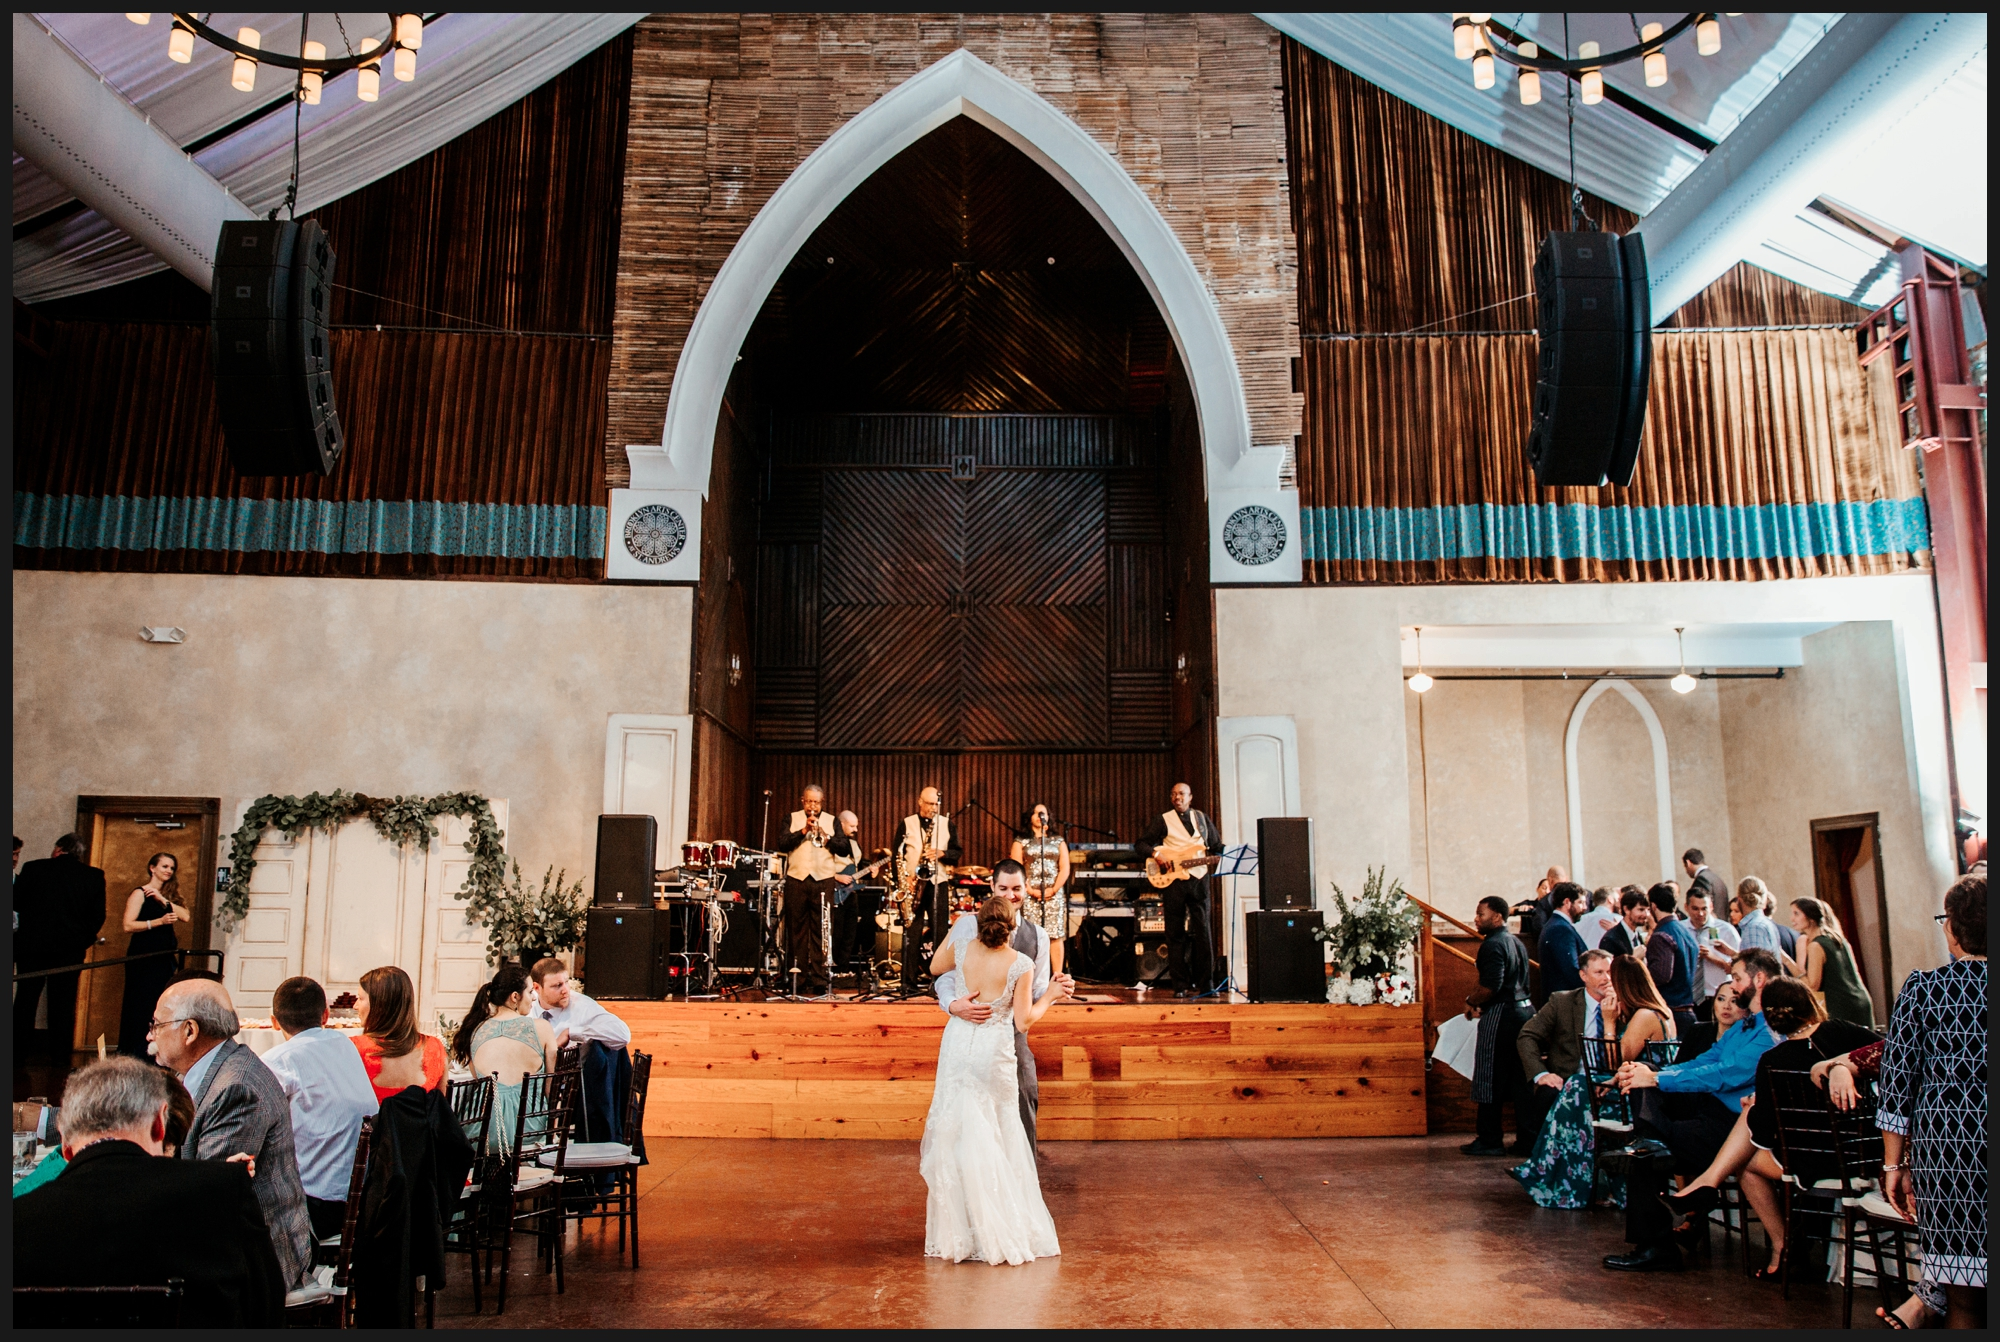 Orlando-Wedding-Photographer-destination-wedding-photographer-florida-wedding-photographer-bohemian-wedding-photographer_0659.jpg